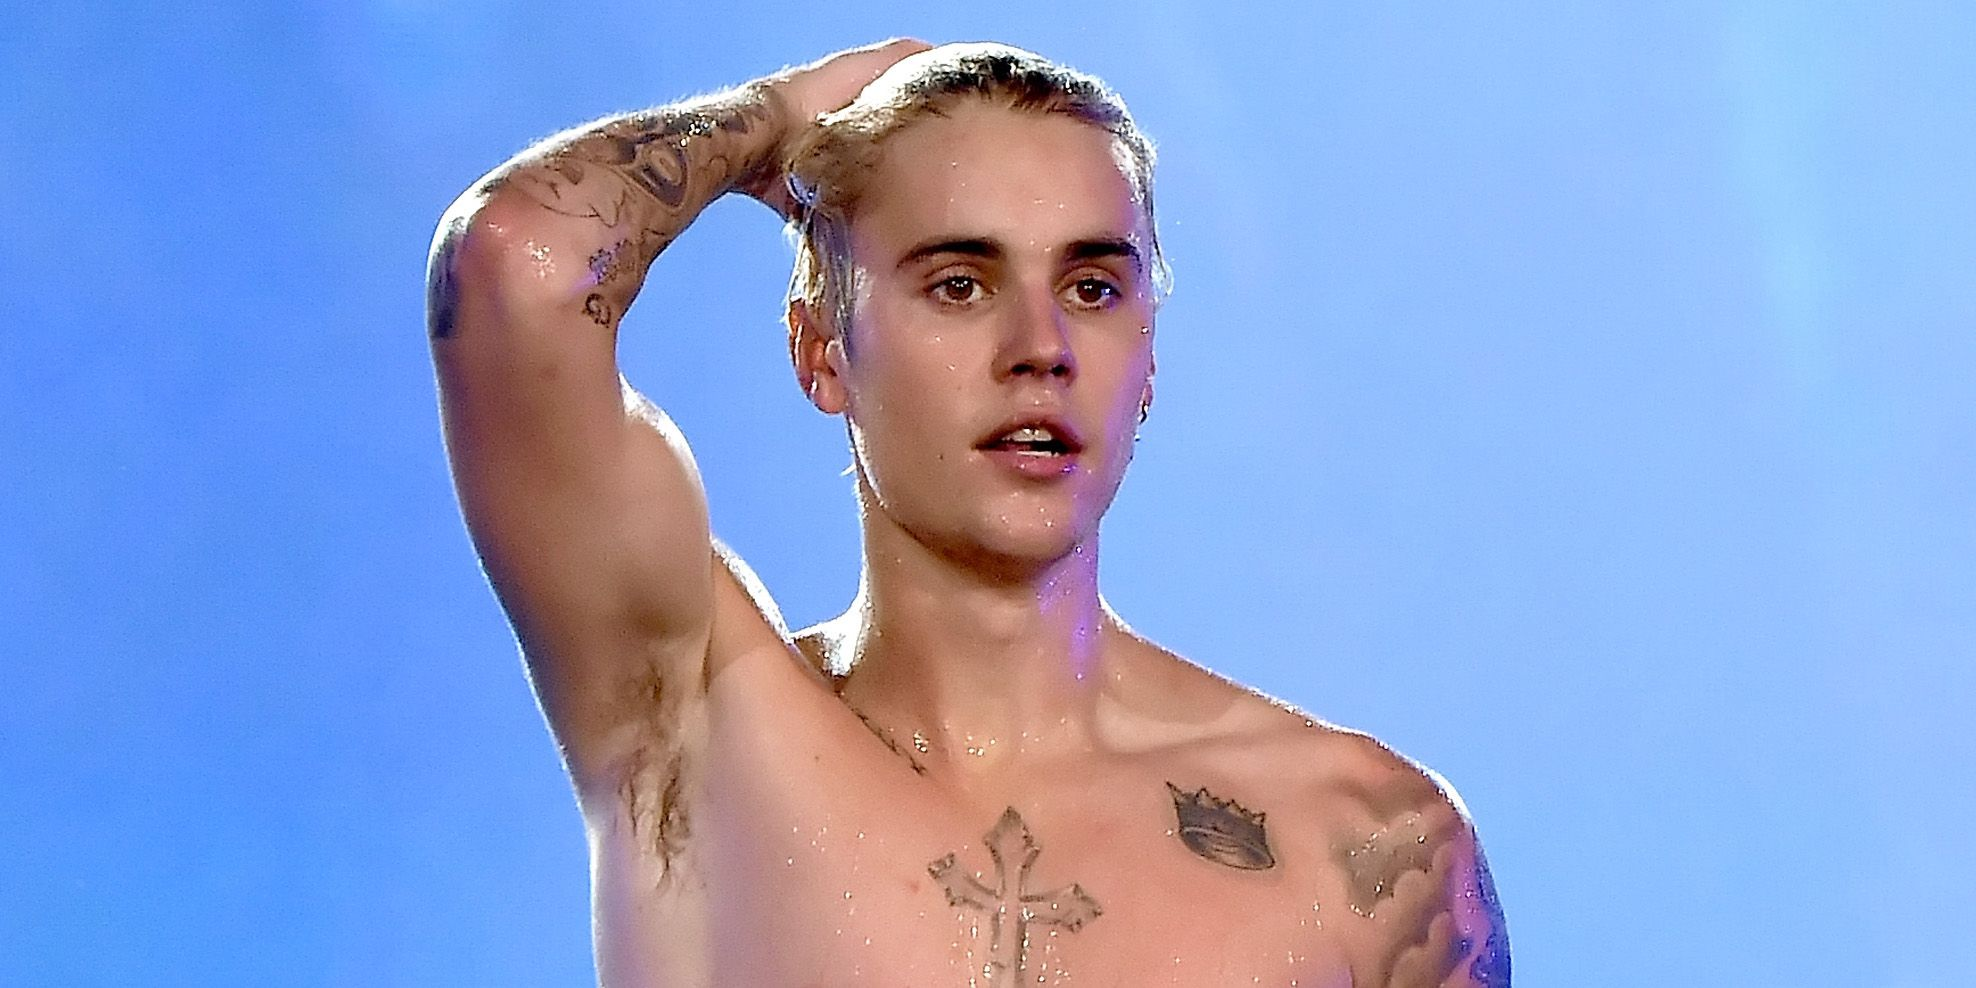 Justin Bieber mystery brunette Selena Gomez